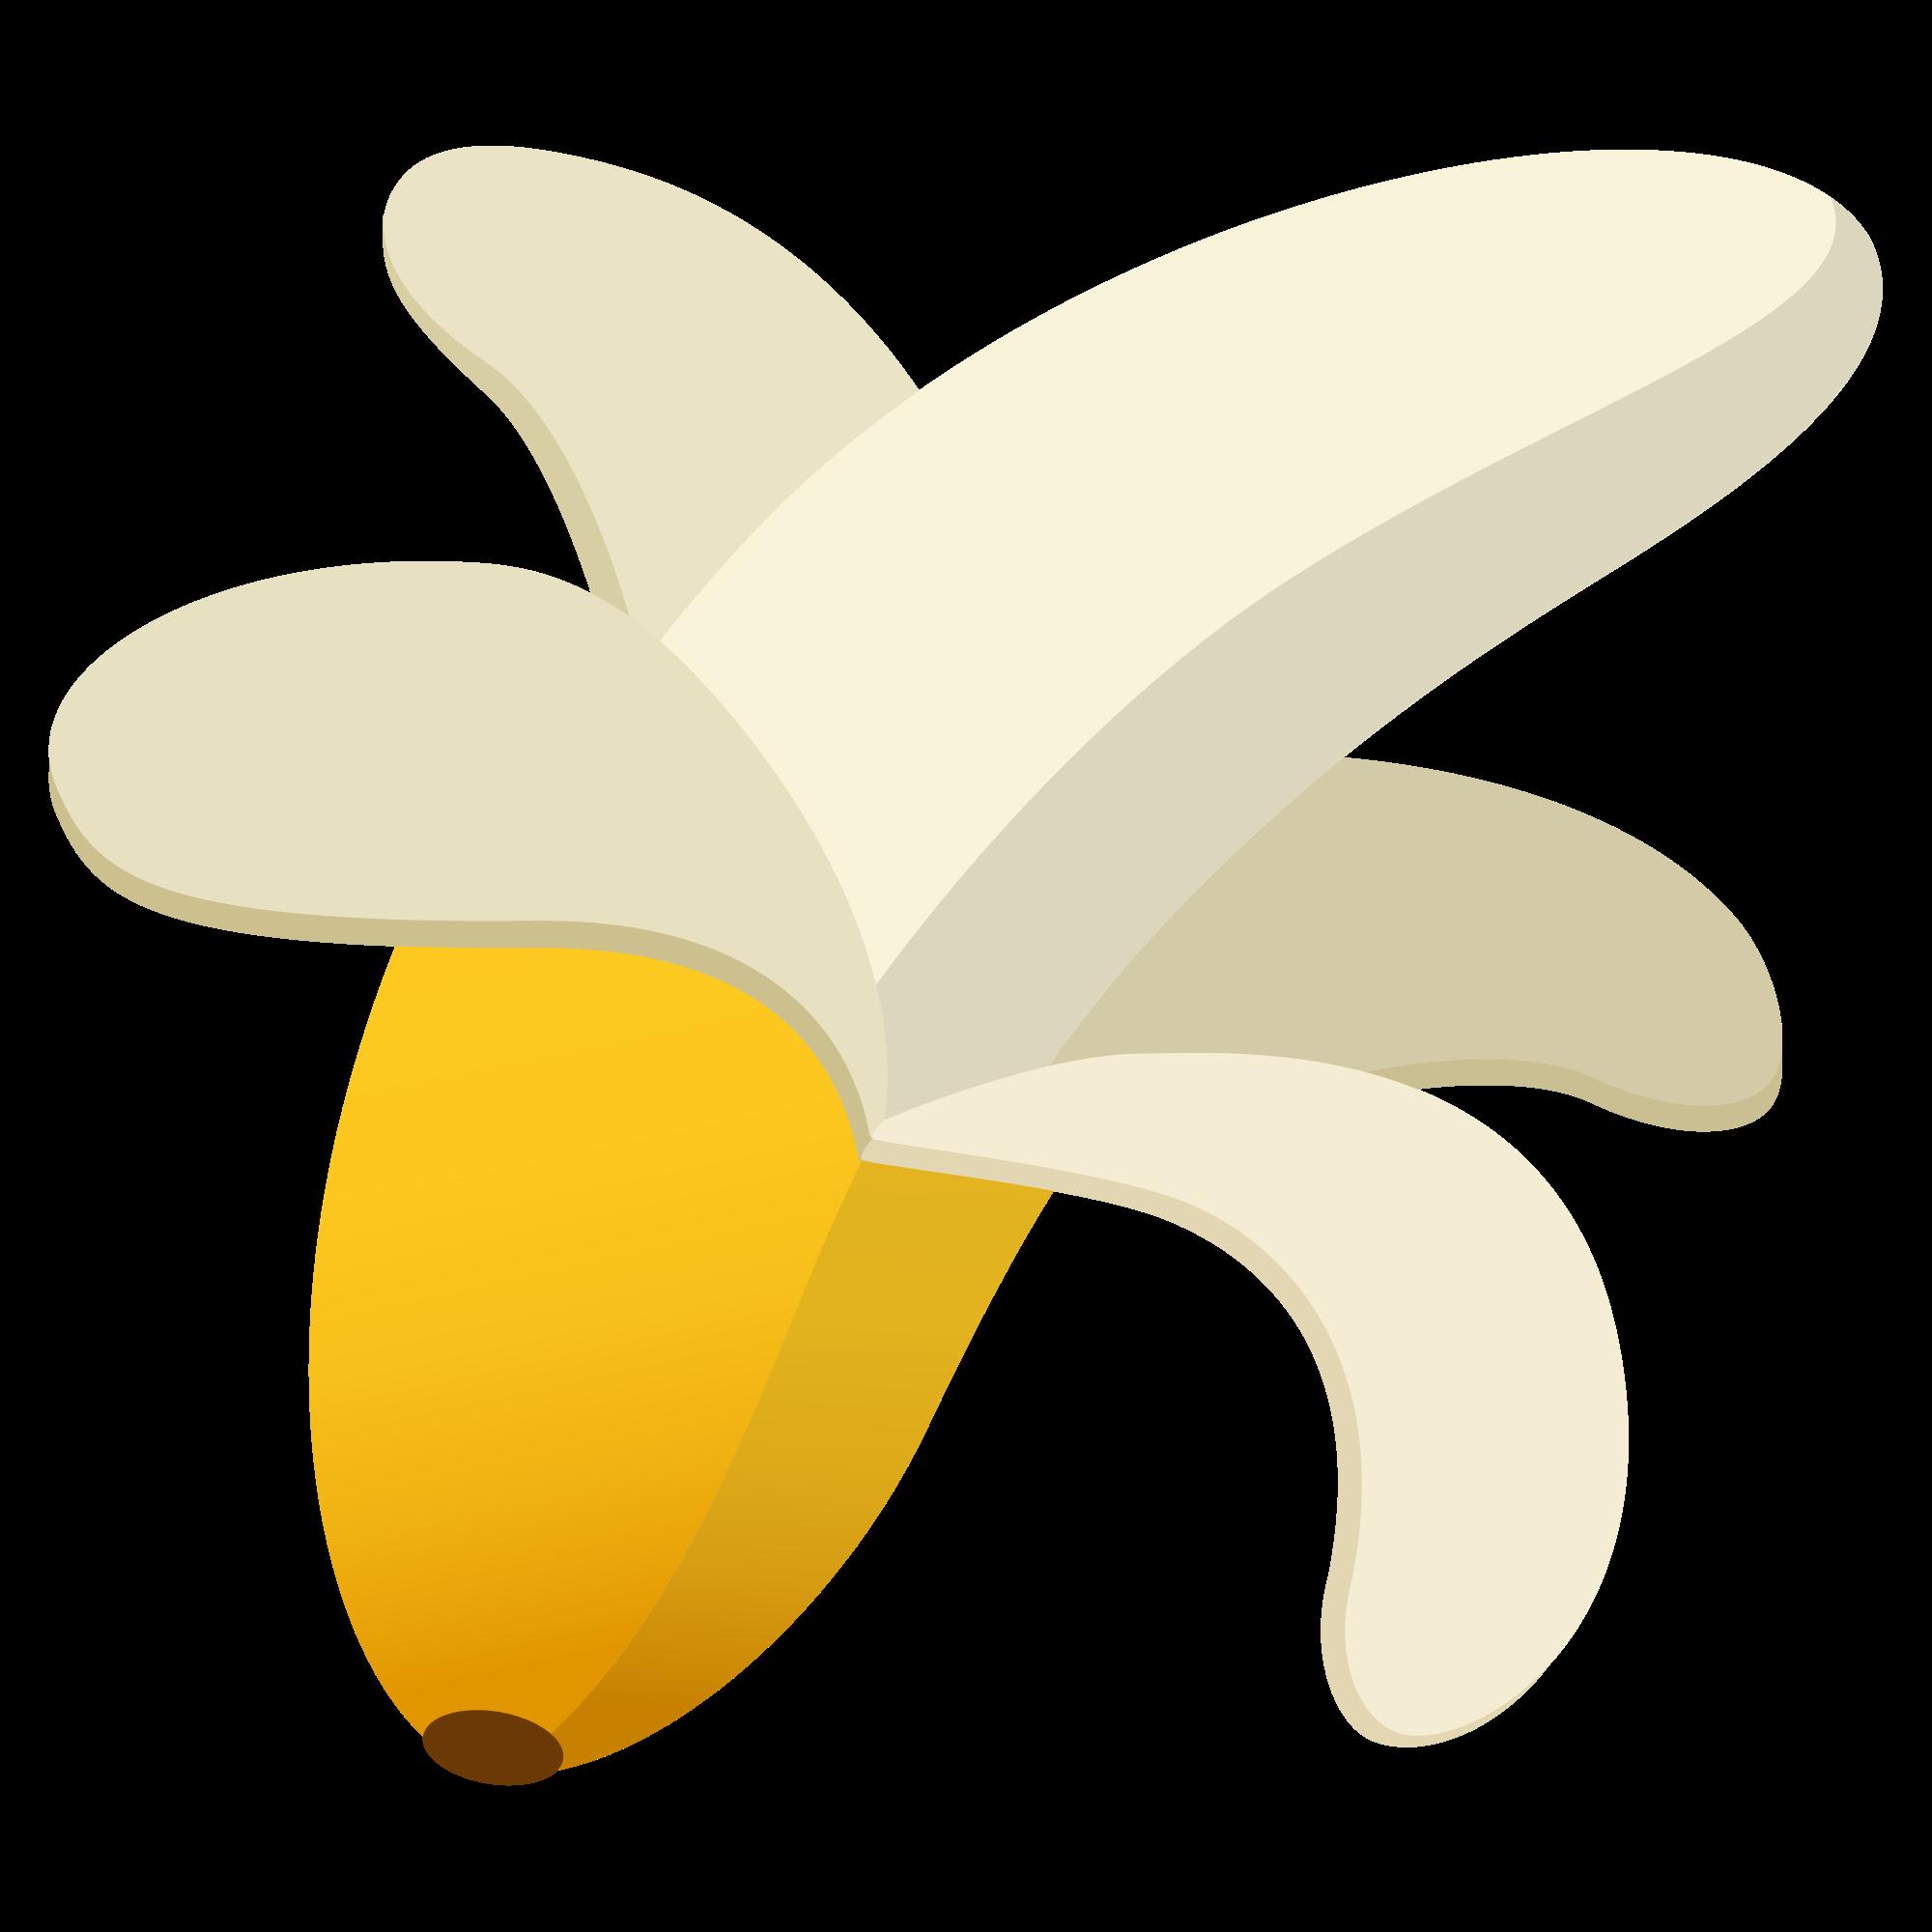 Emoji clipart banana. File u f c